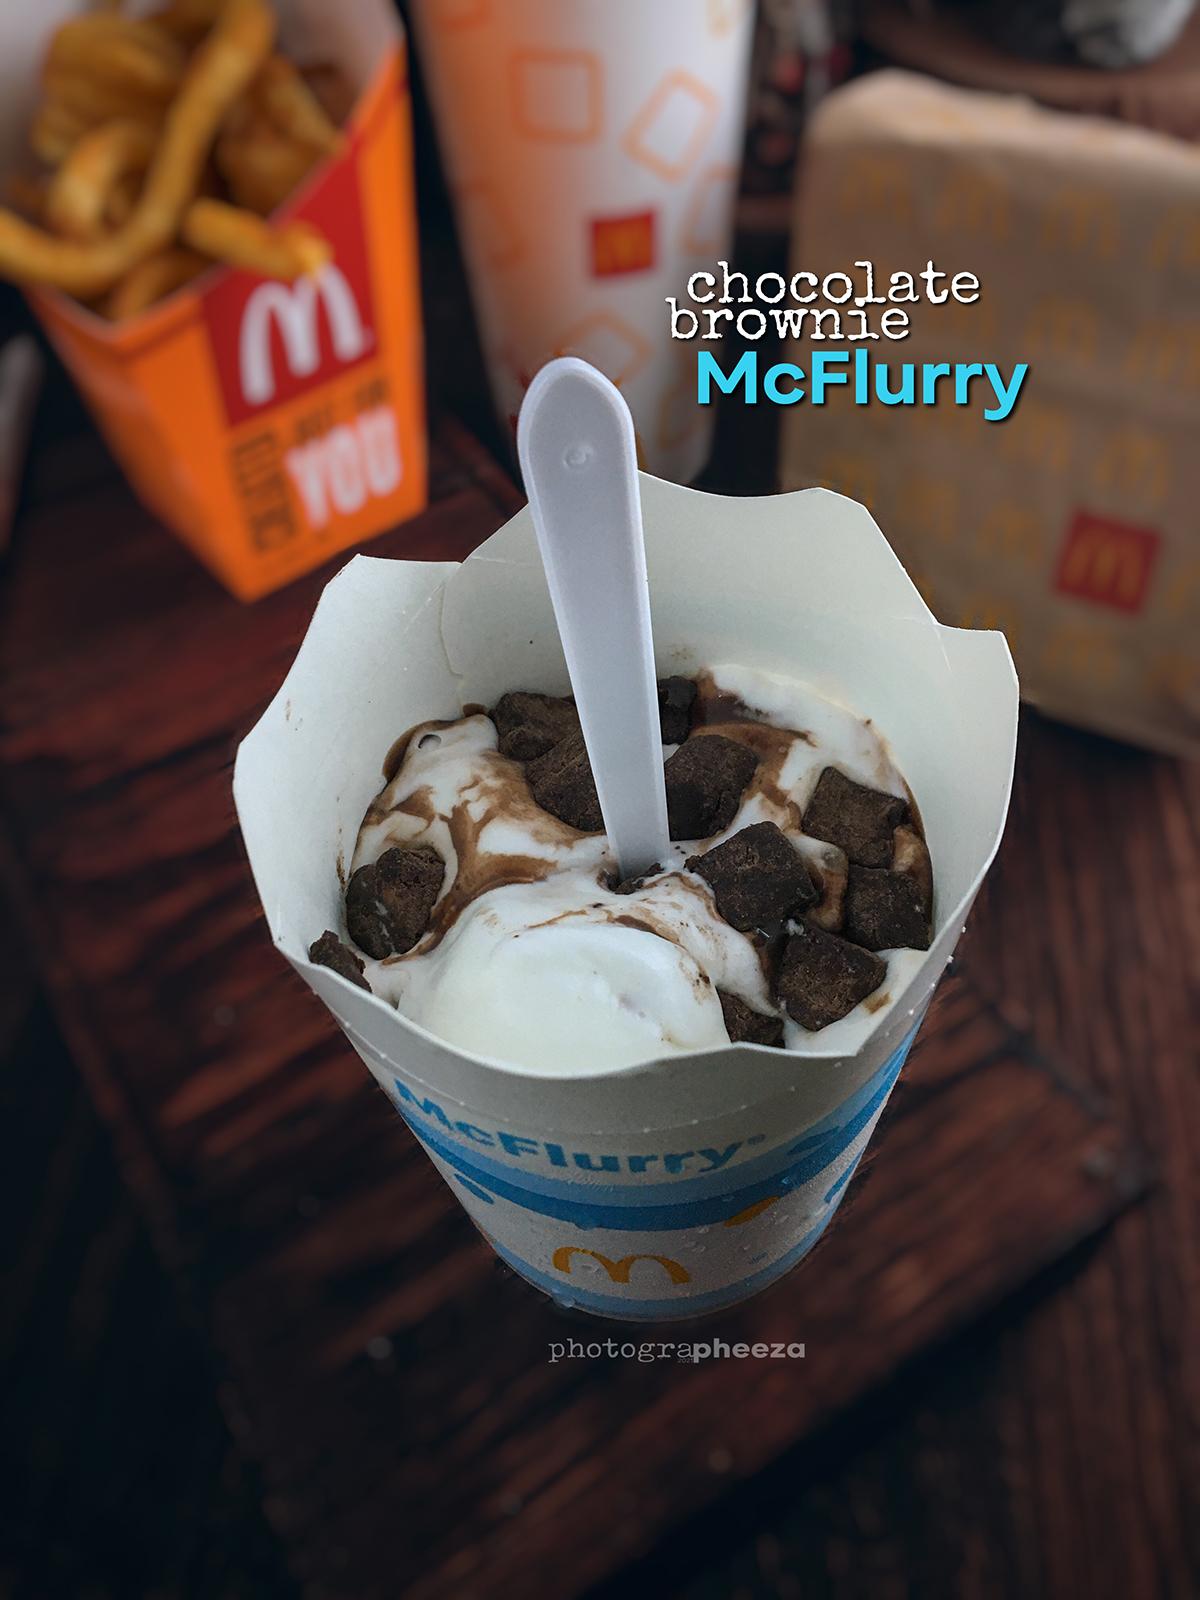 Prosperity Desserts Chocolate Brownie McFlurry McD